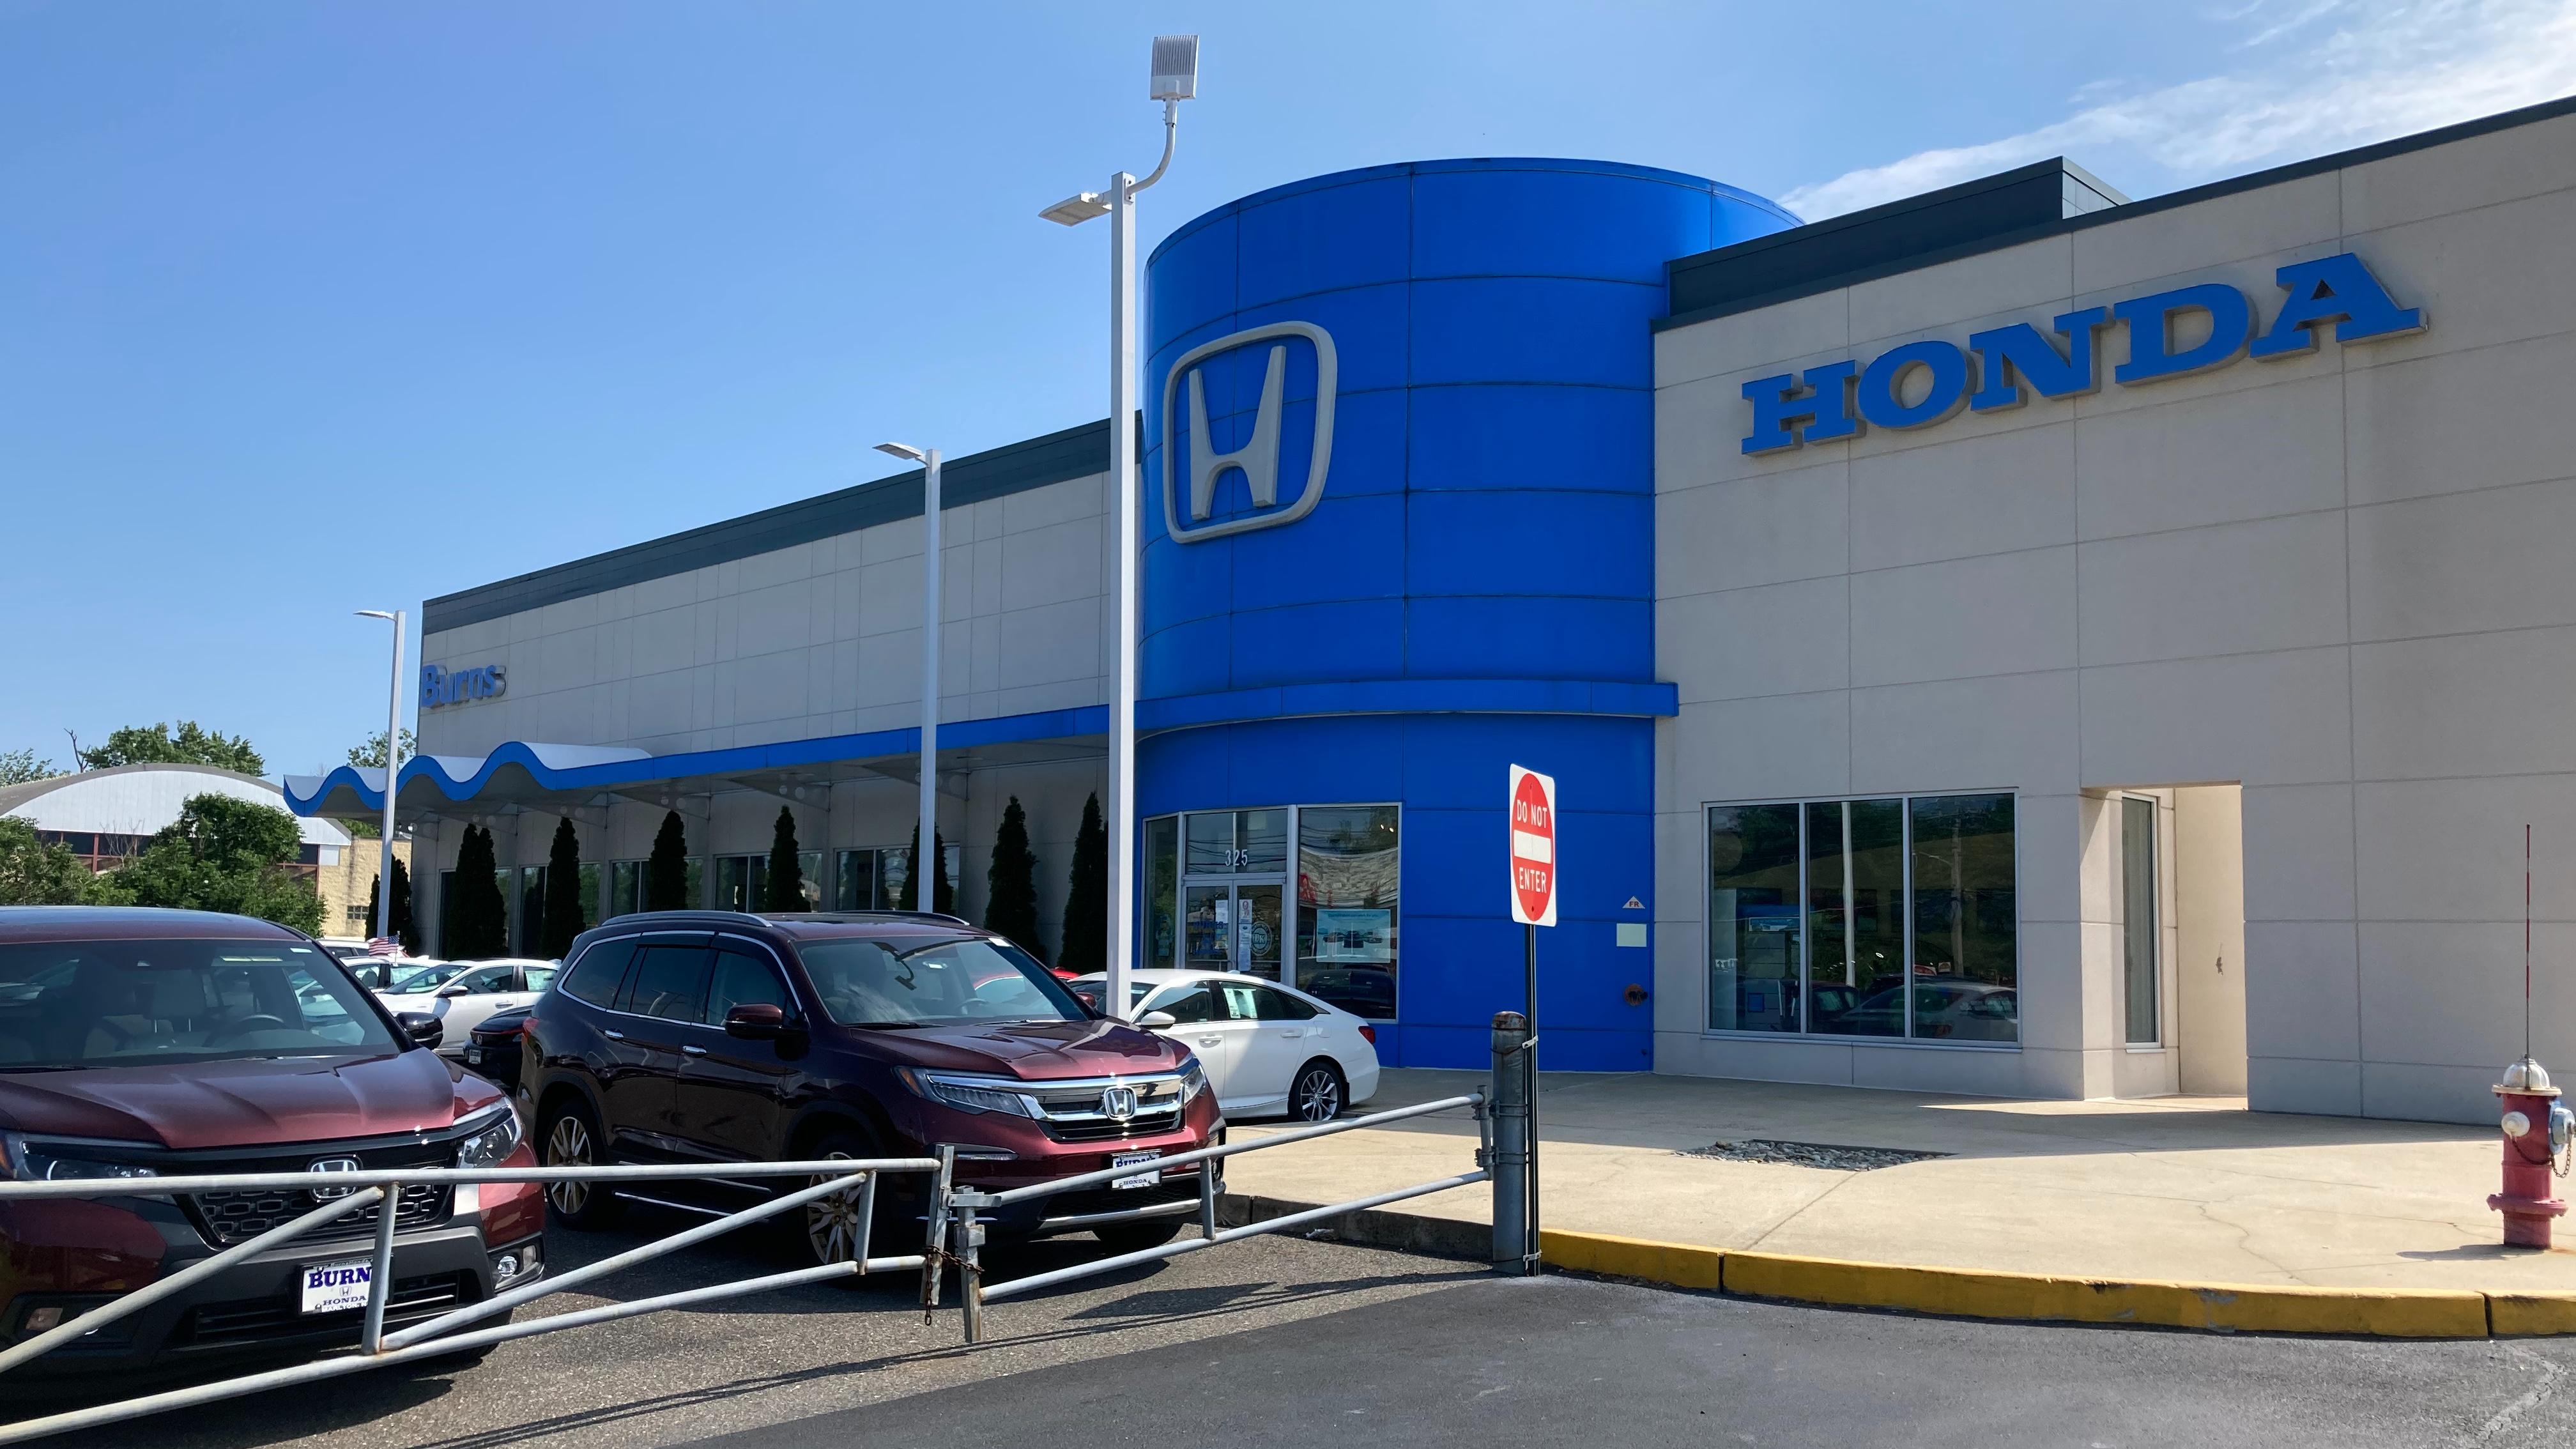 Exterior of Burns Honda dealership.